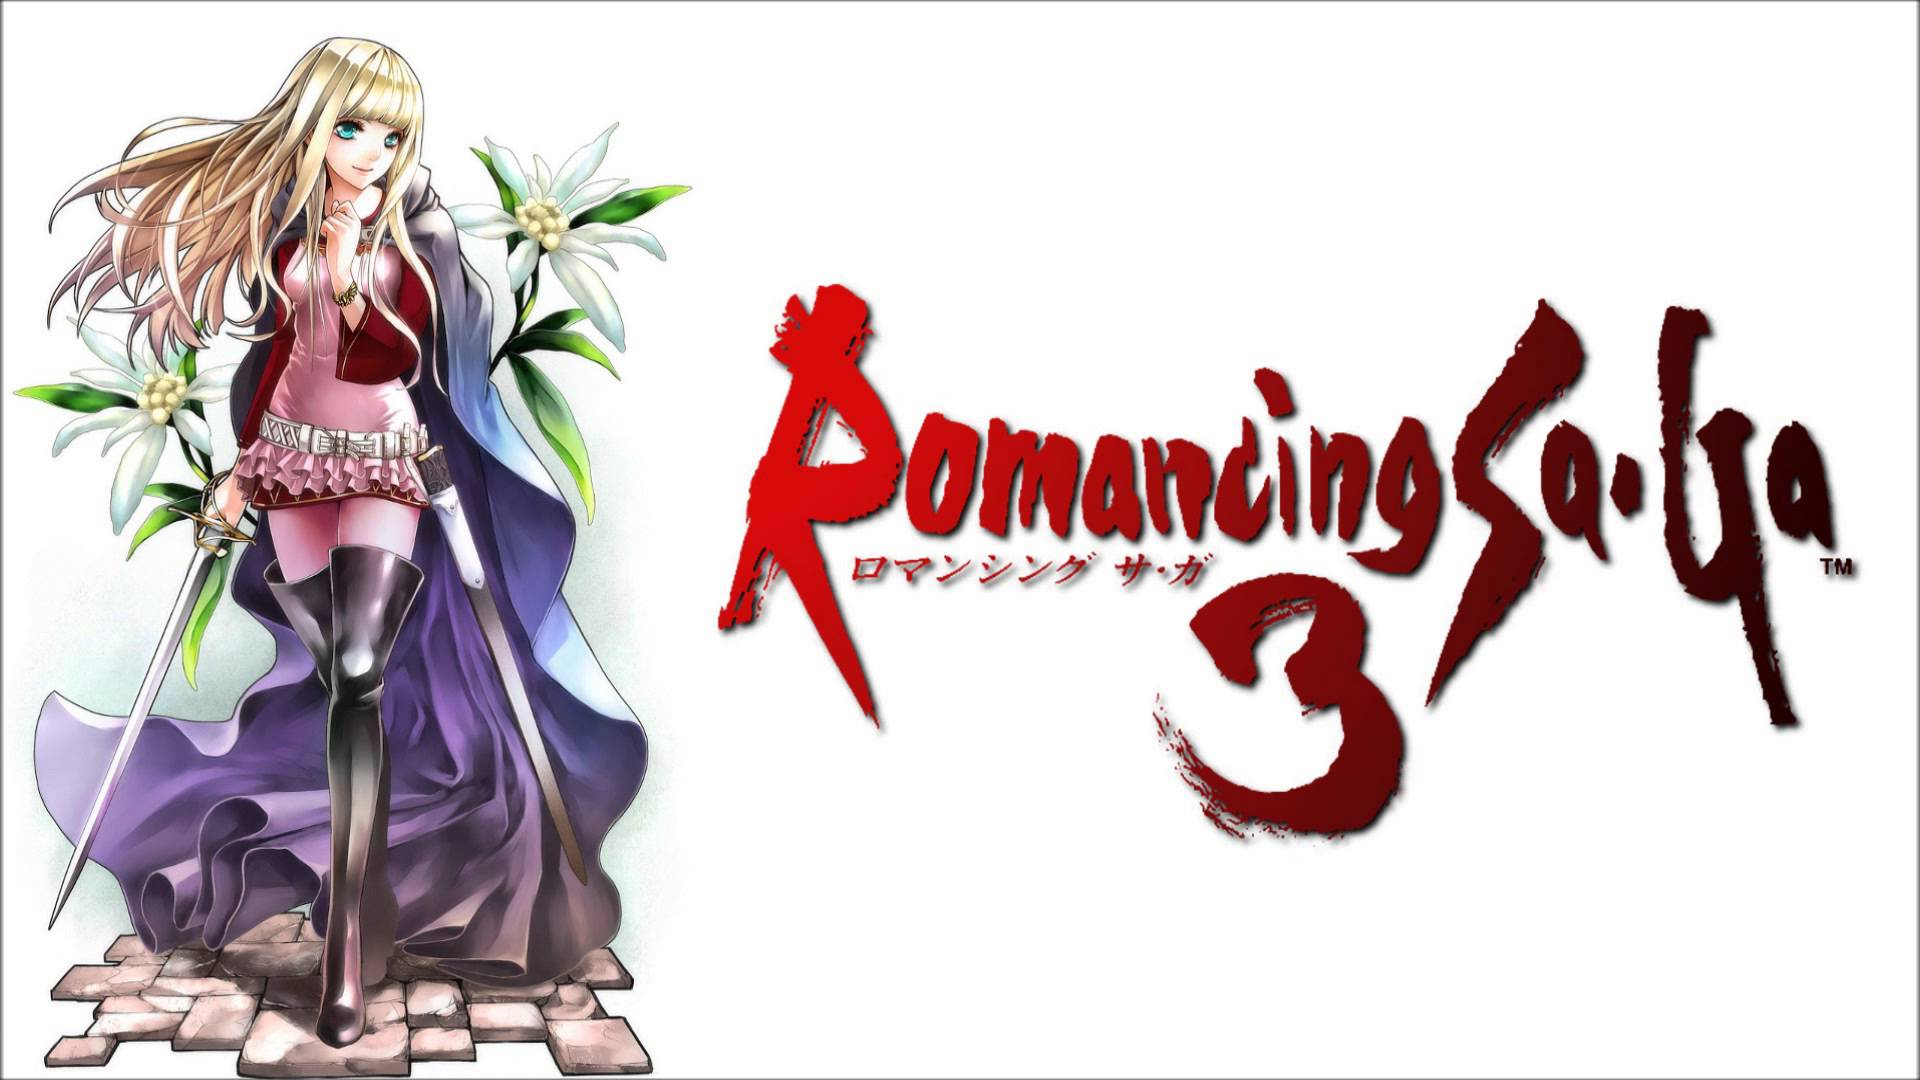 Romancing SaGa 3 coming to Nintendo Switch in early 2019 | GoNintendo